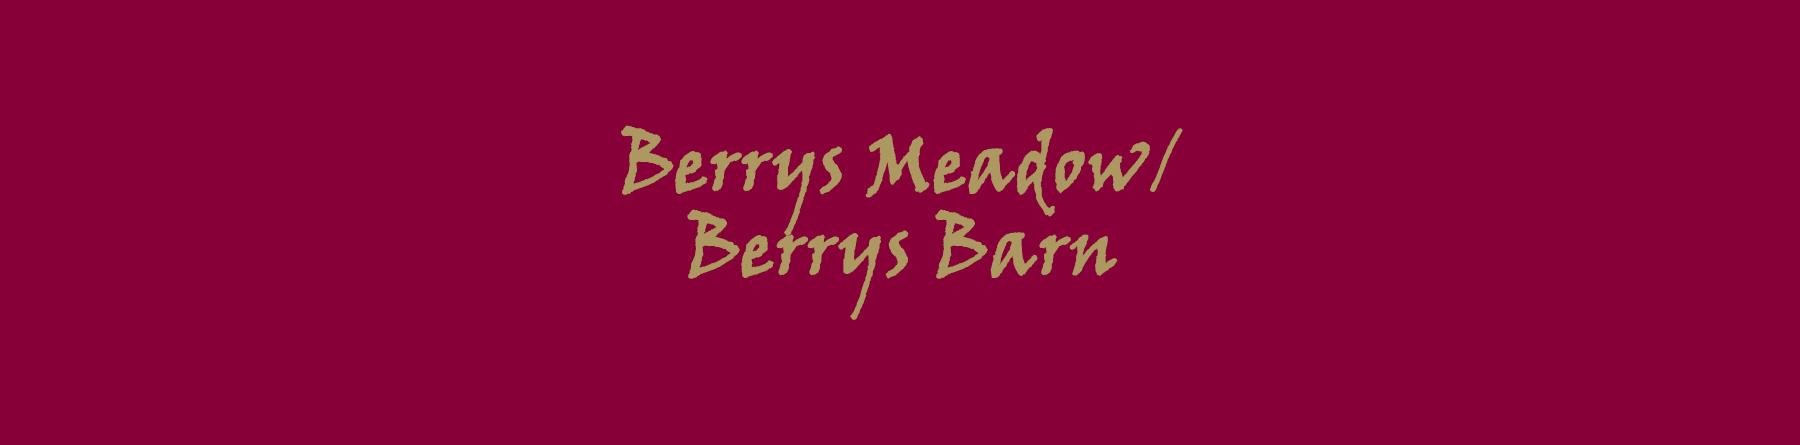 slides-berrys-barn-title